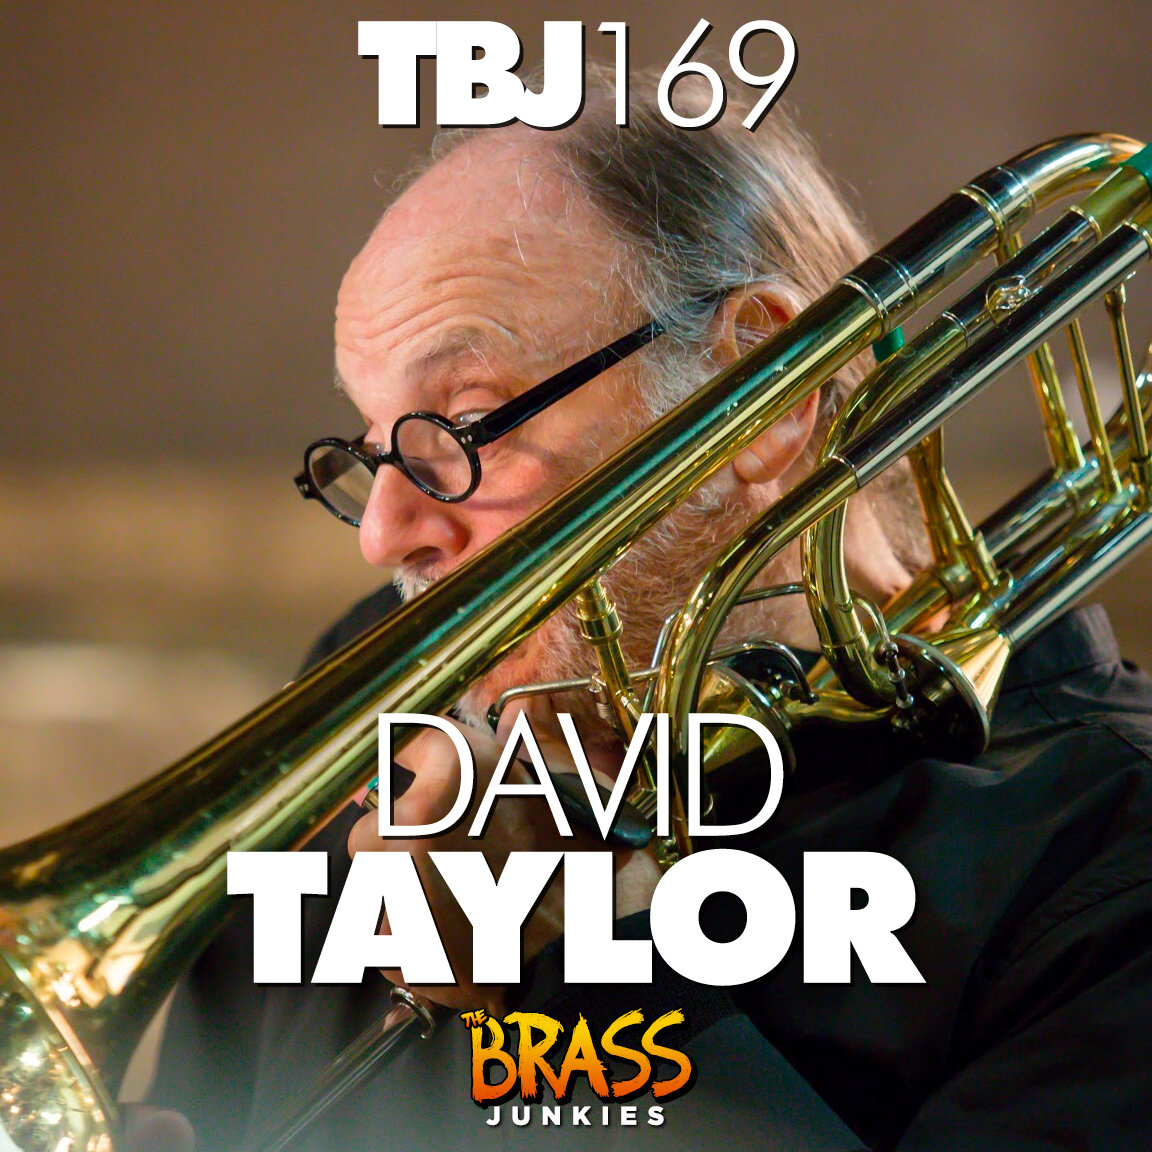 David Taylor on the Brass Junkies